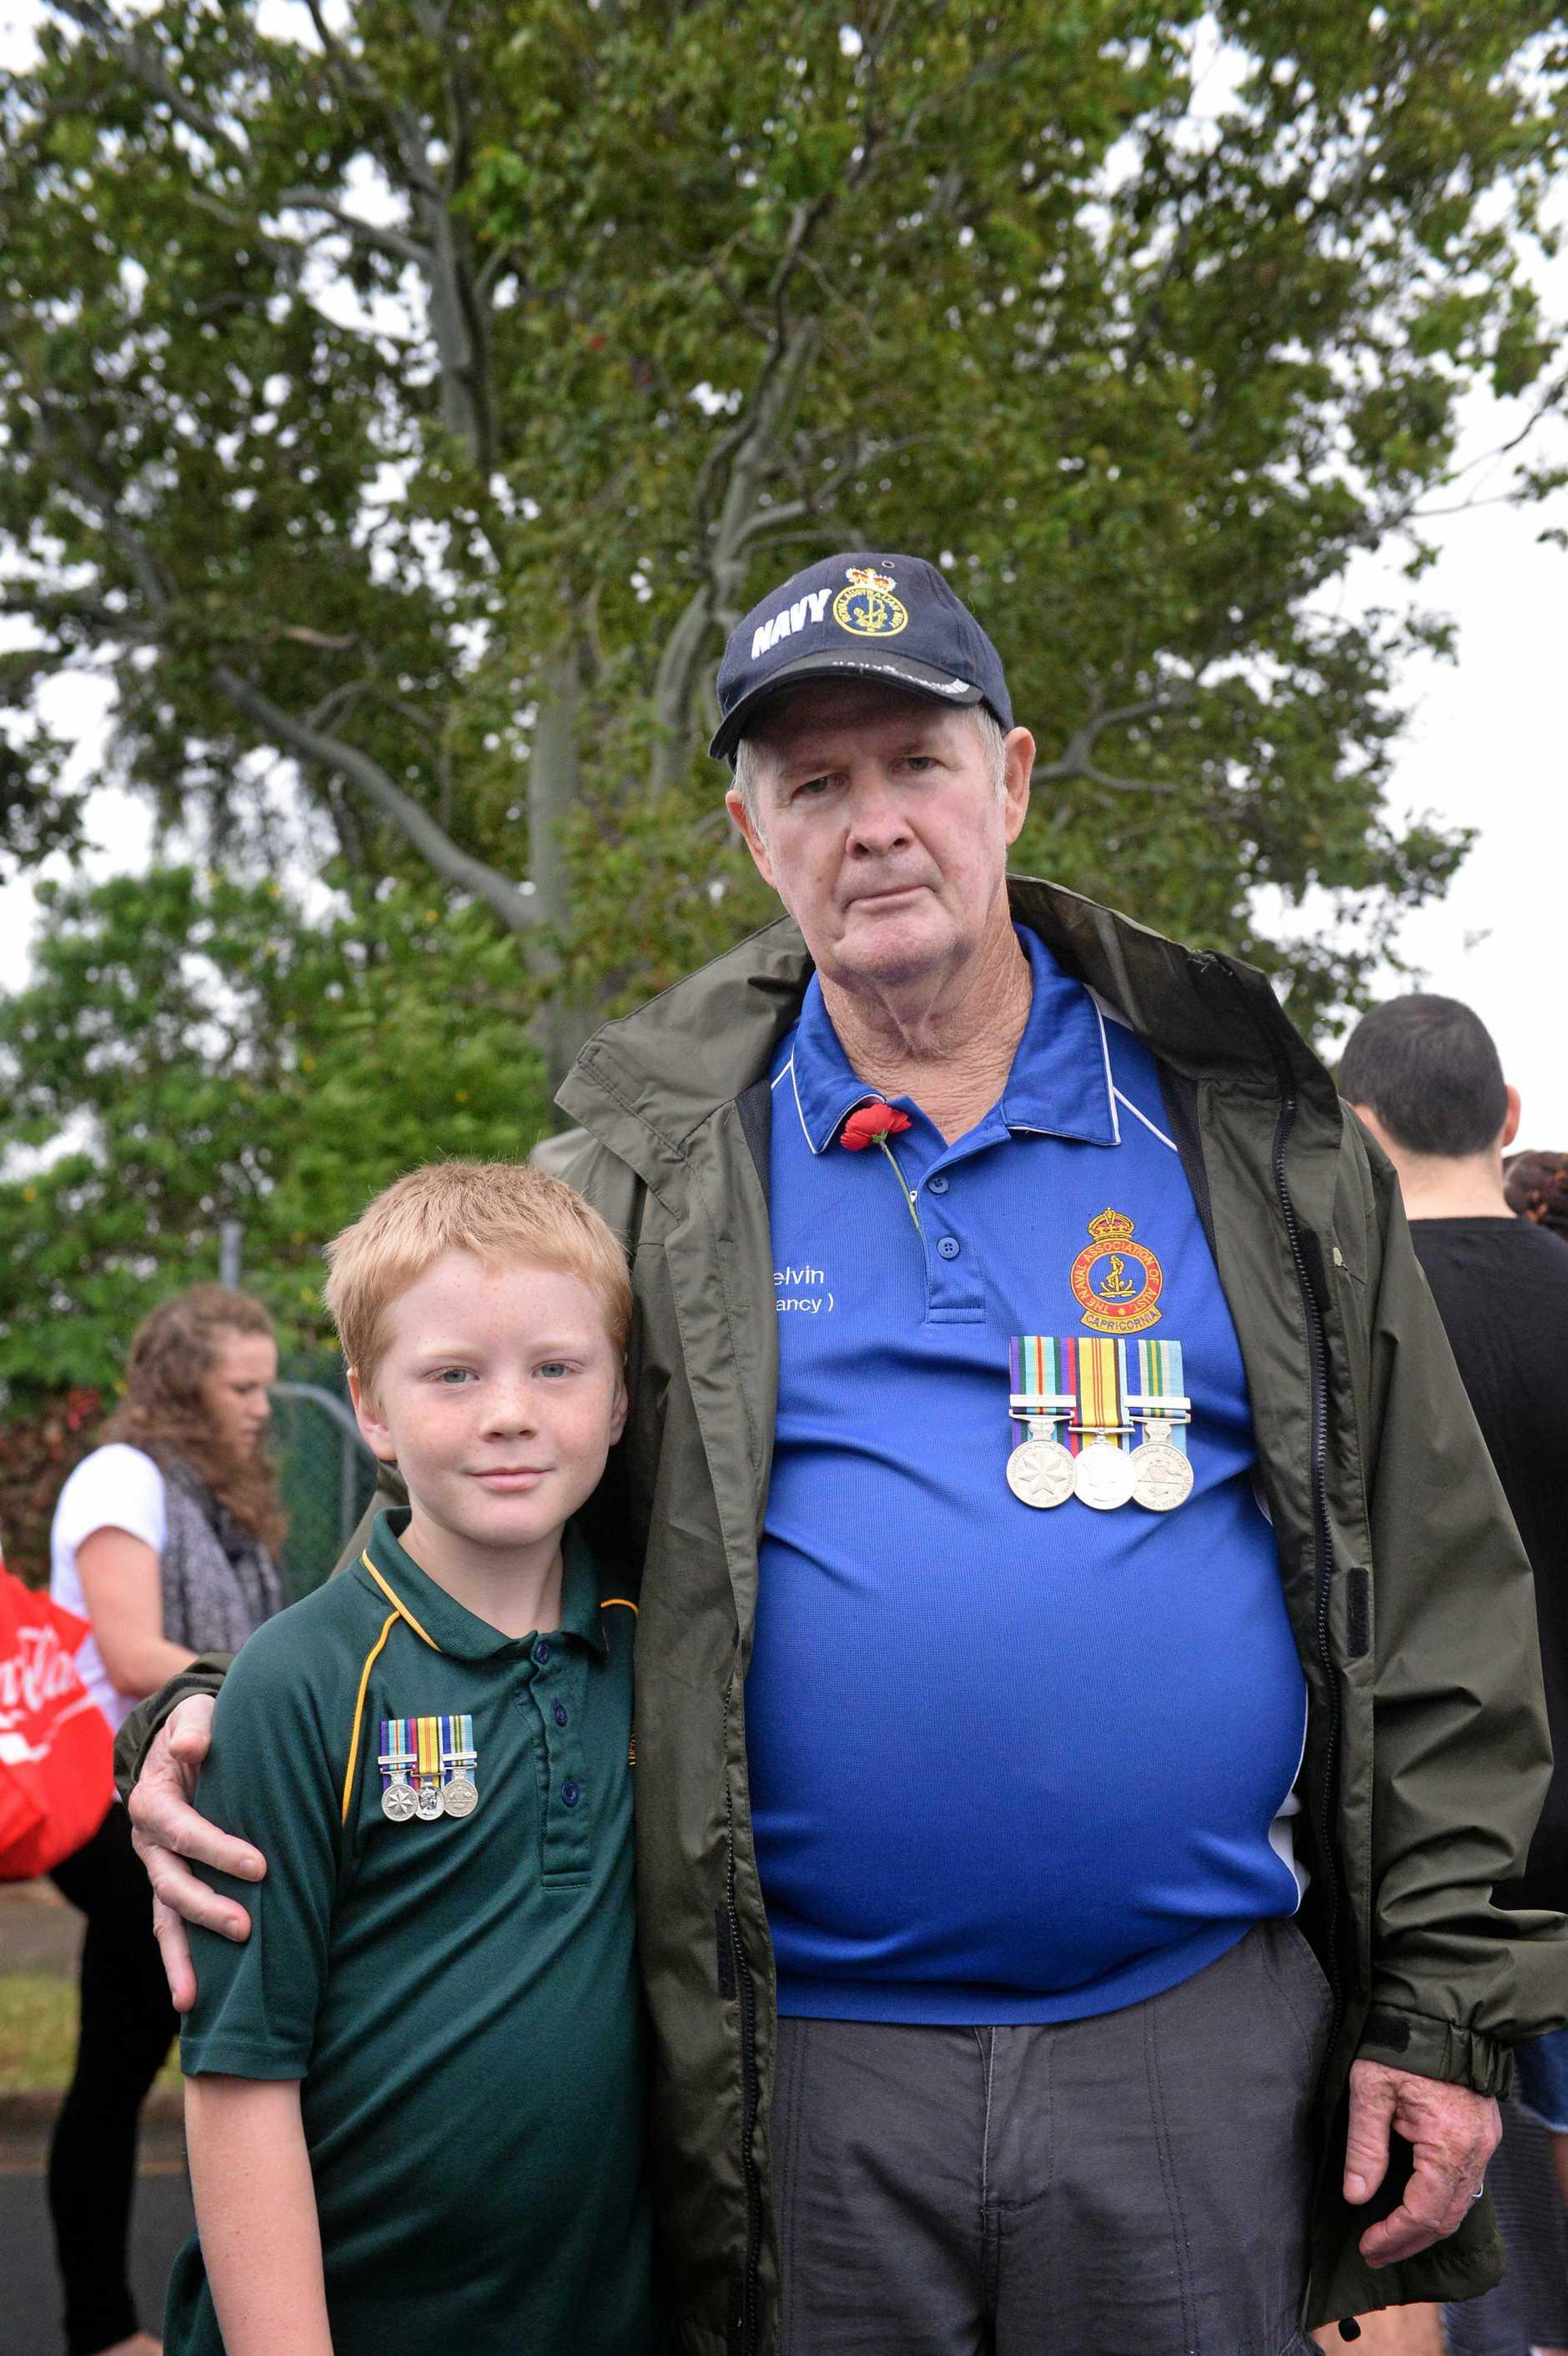 Parker and Kelvin Carolan at the Rockhampton Anzac Day parade.